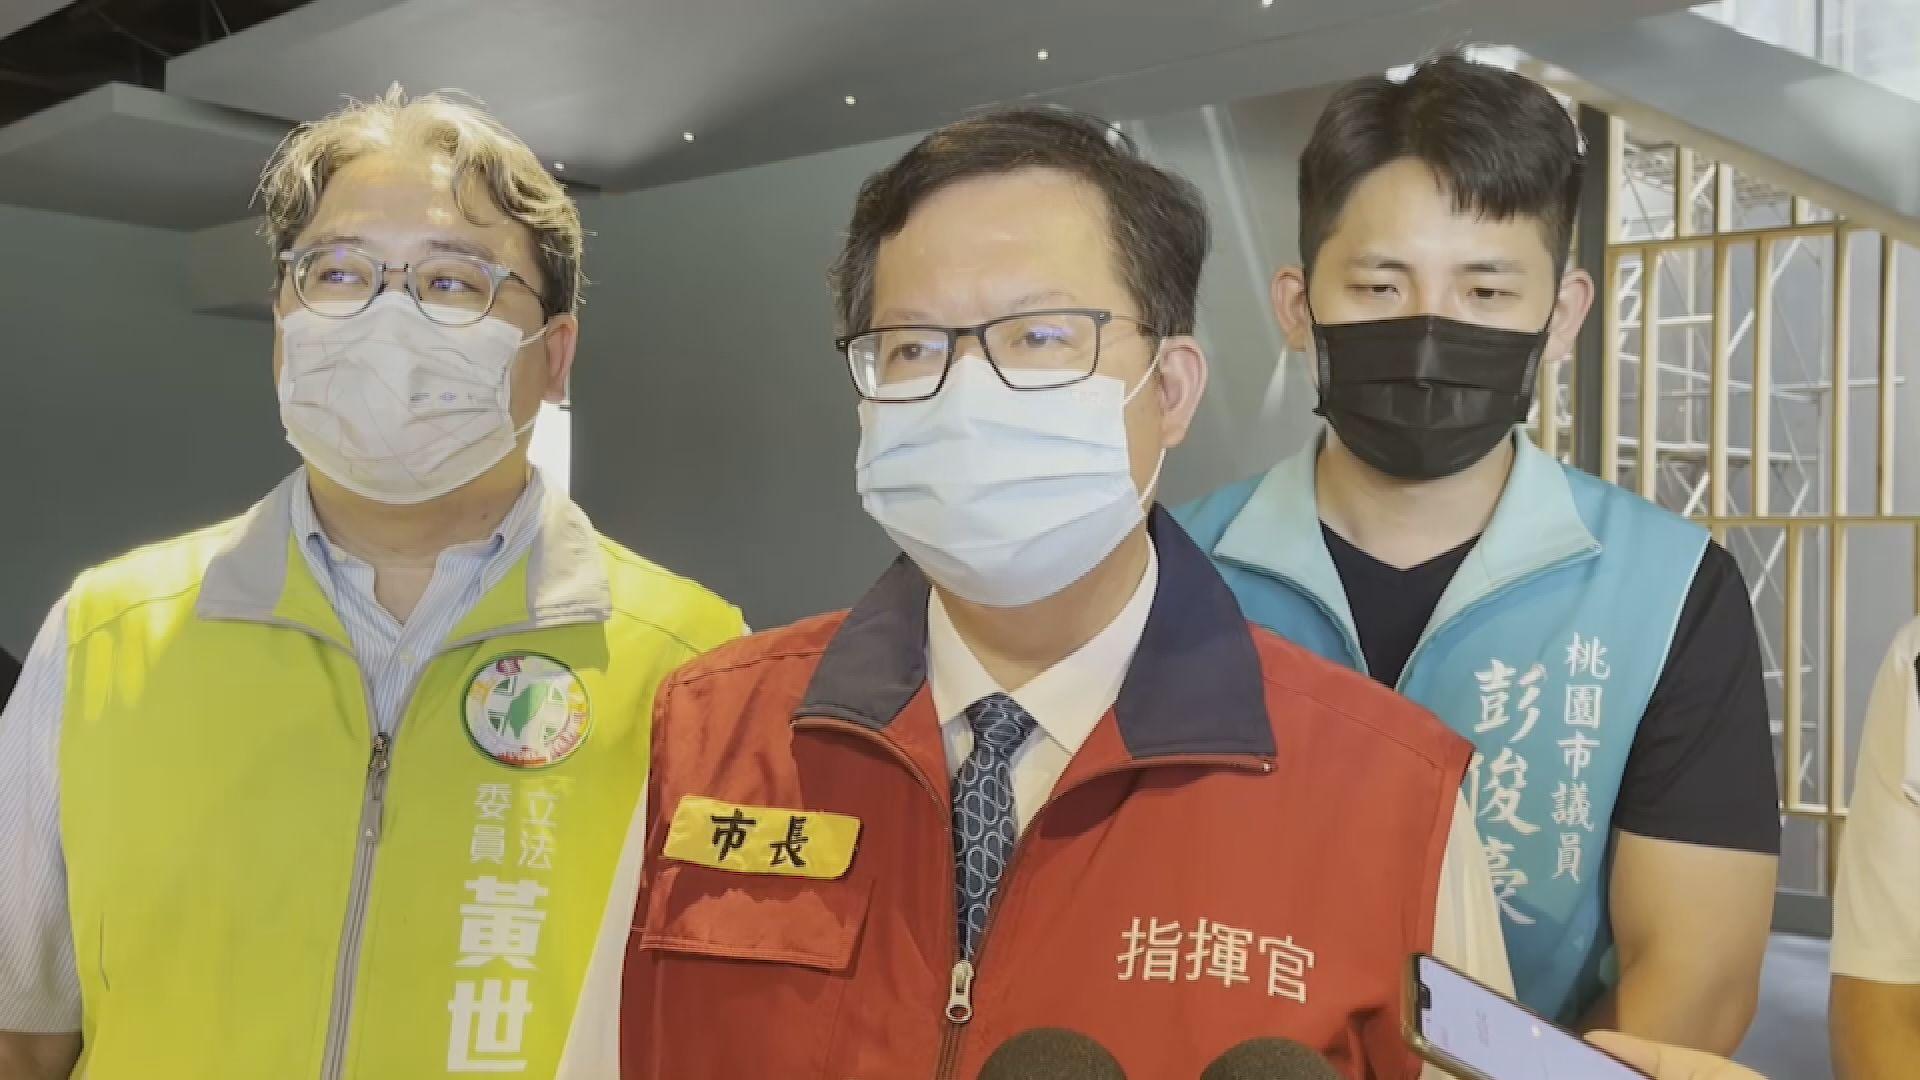 Taoyuan Int'l Airport Steps Up Testing After Positive Case  桃勤女員工確診 347人陰性.另49人採檢中